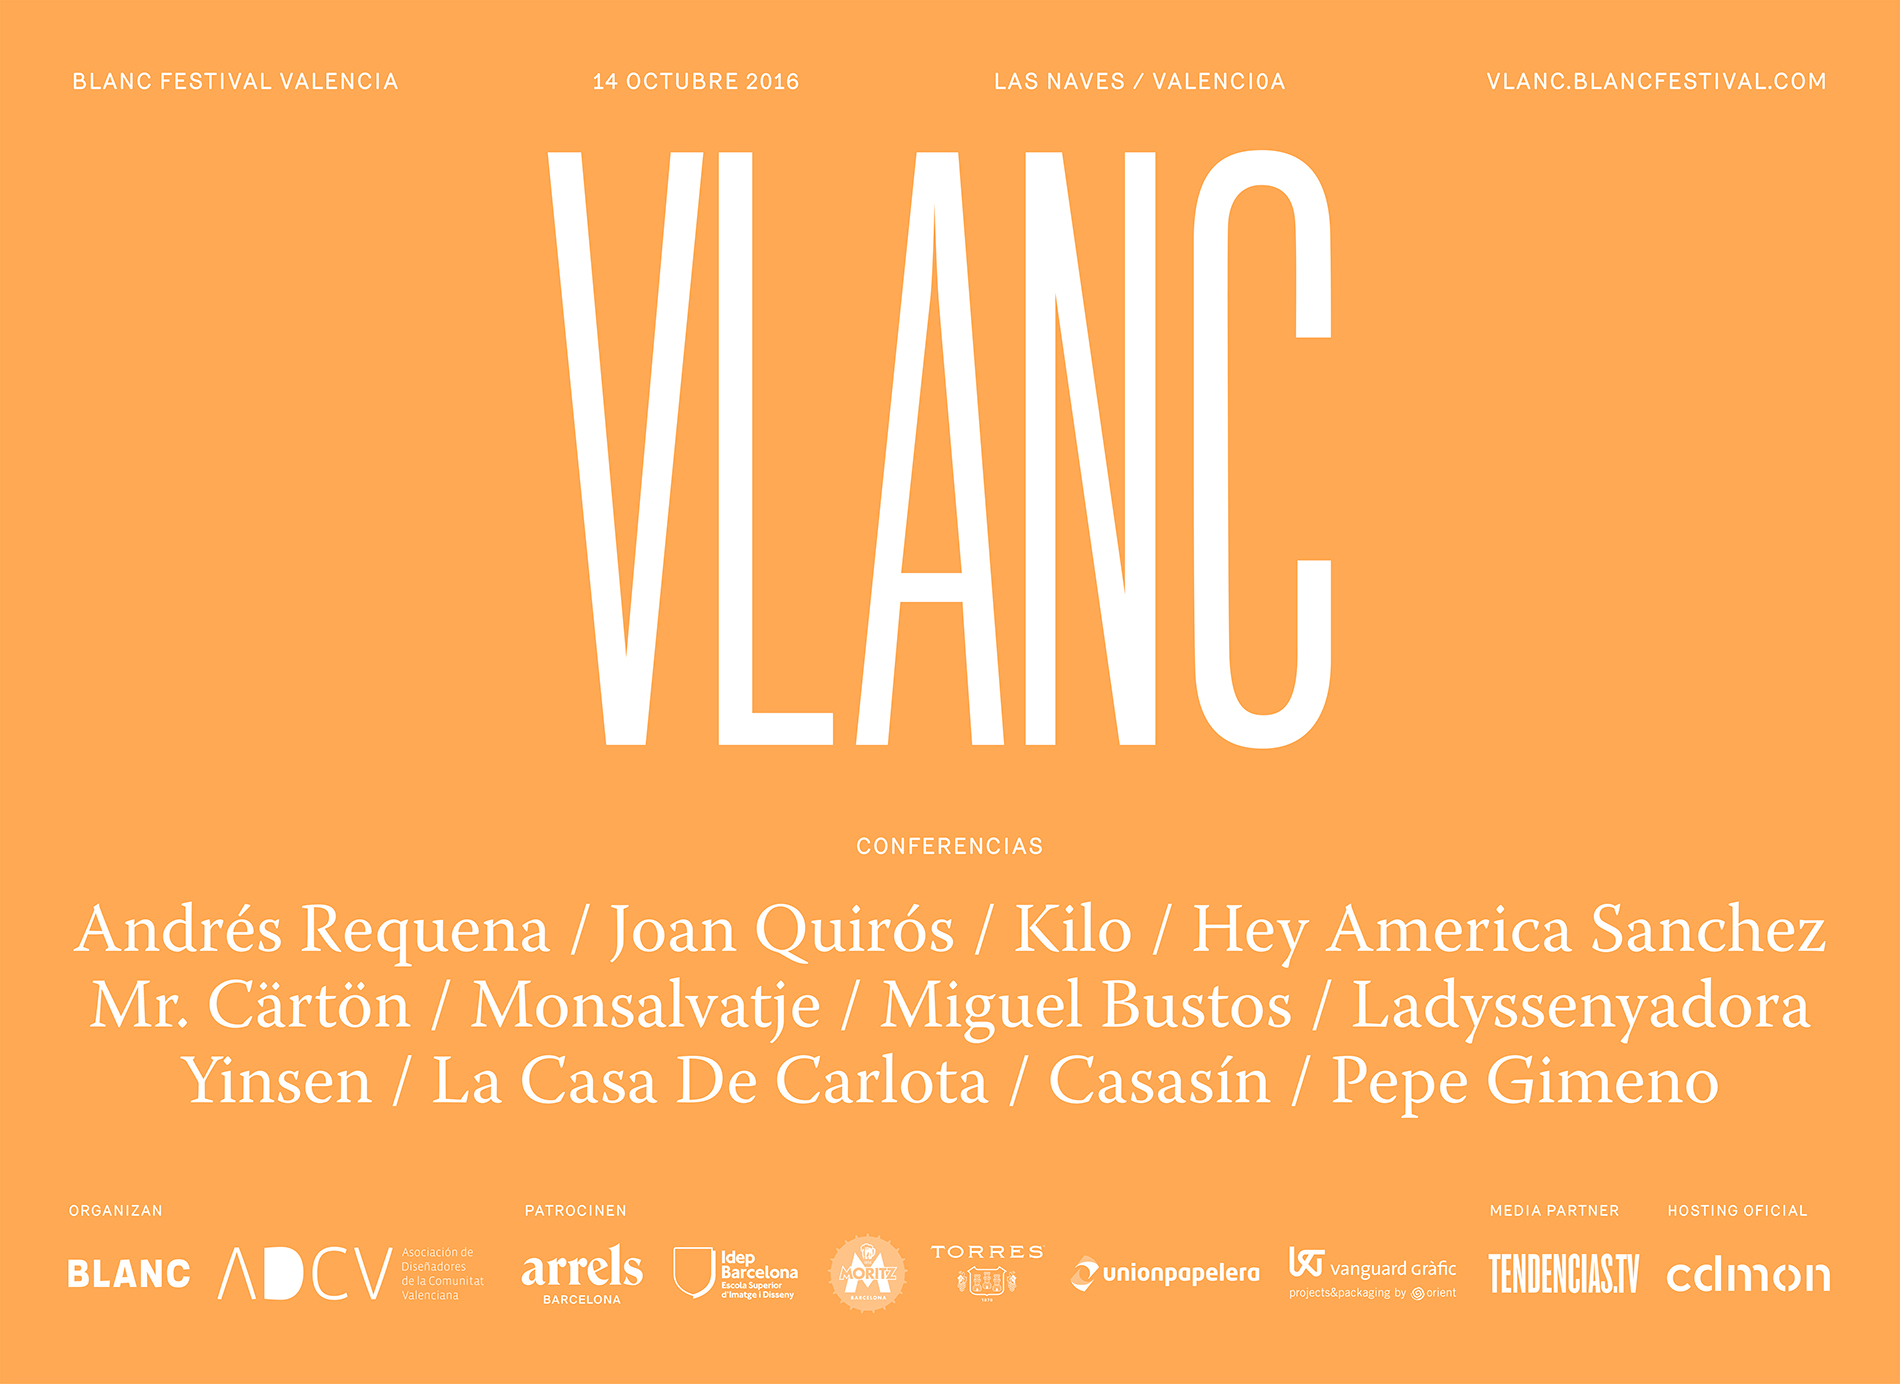 vlanc-valencia-2016-2.jpg